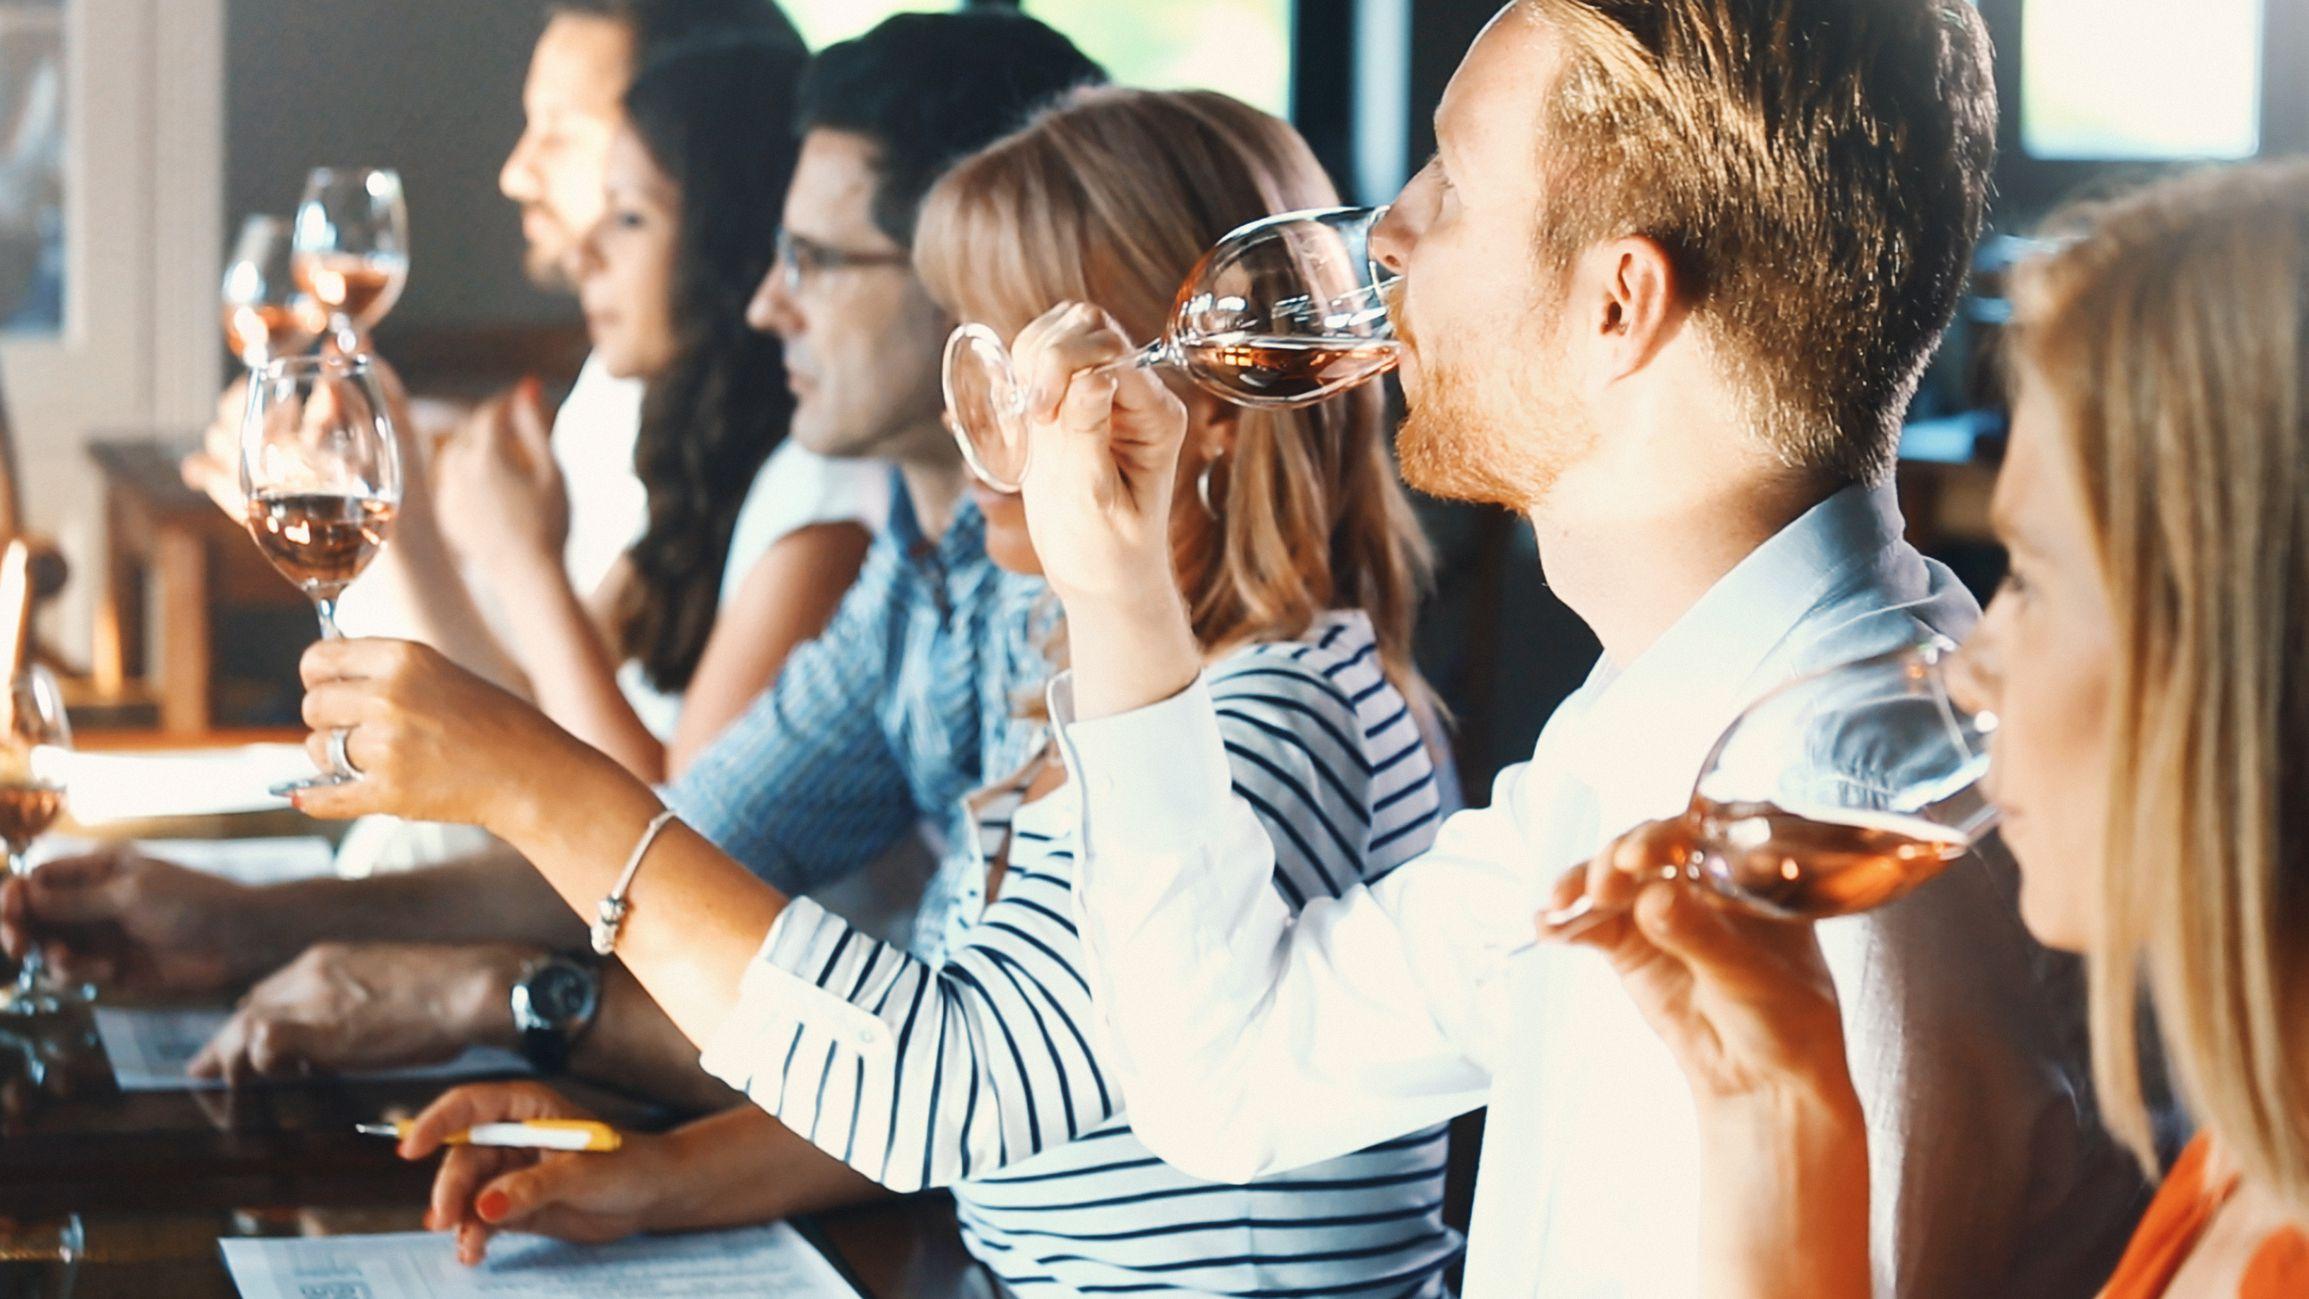 l'oreal consumer testing